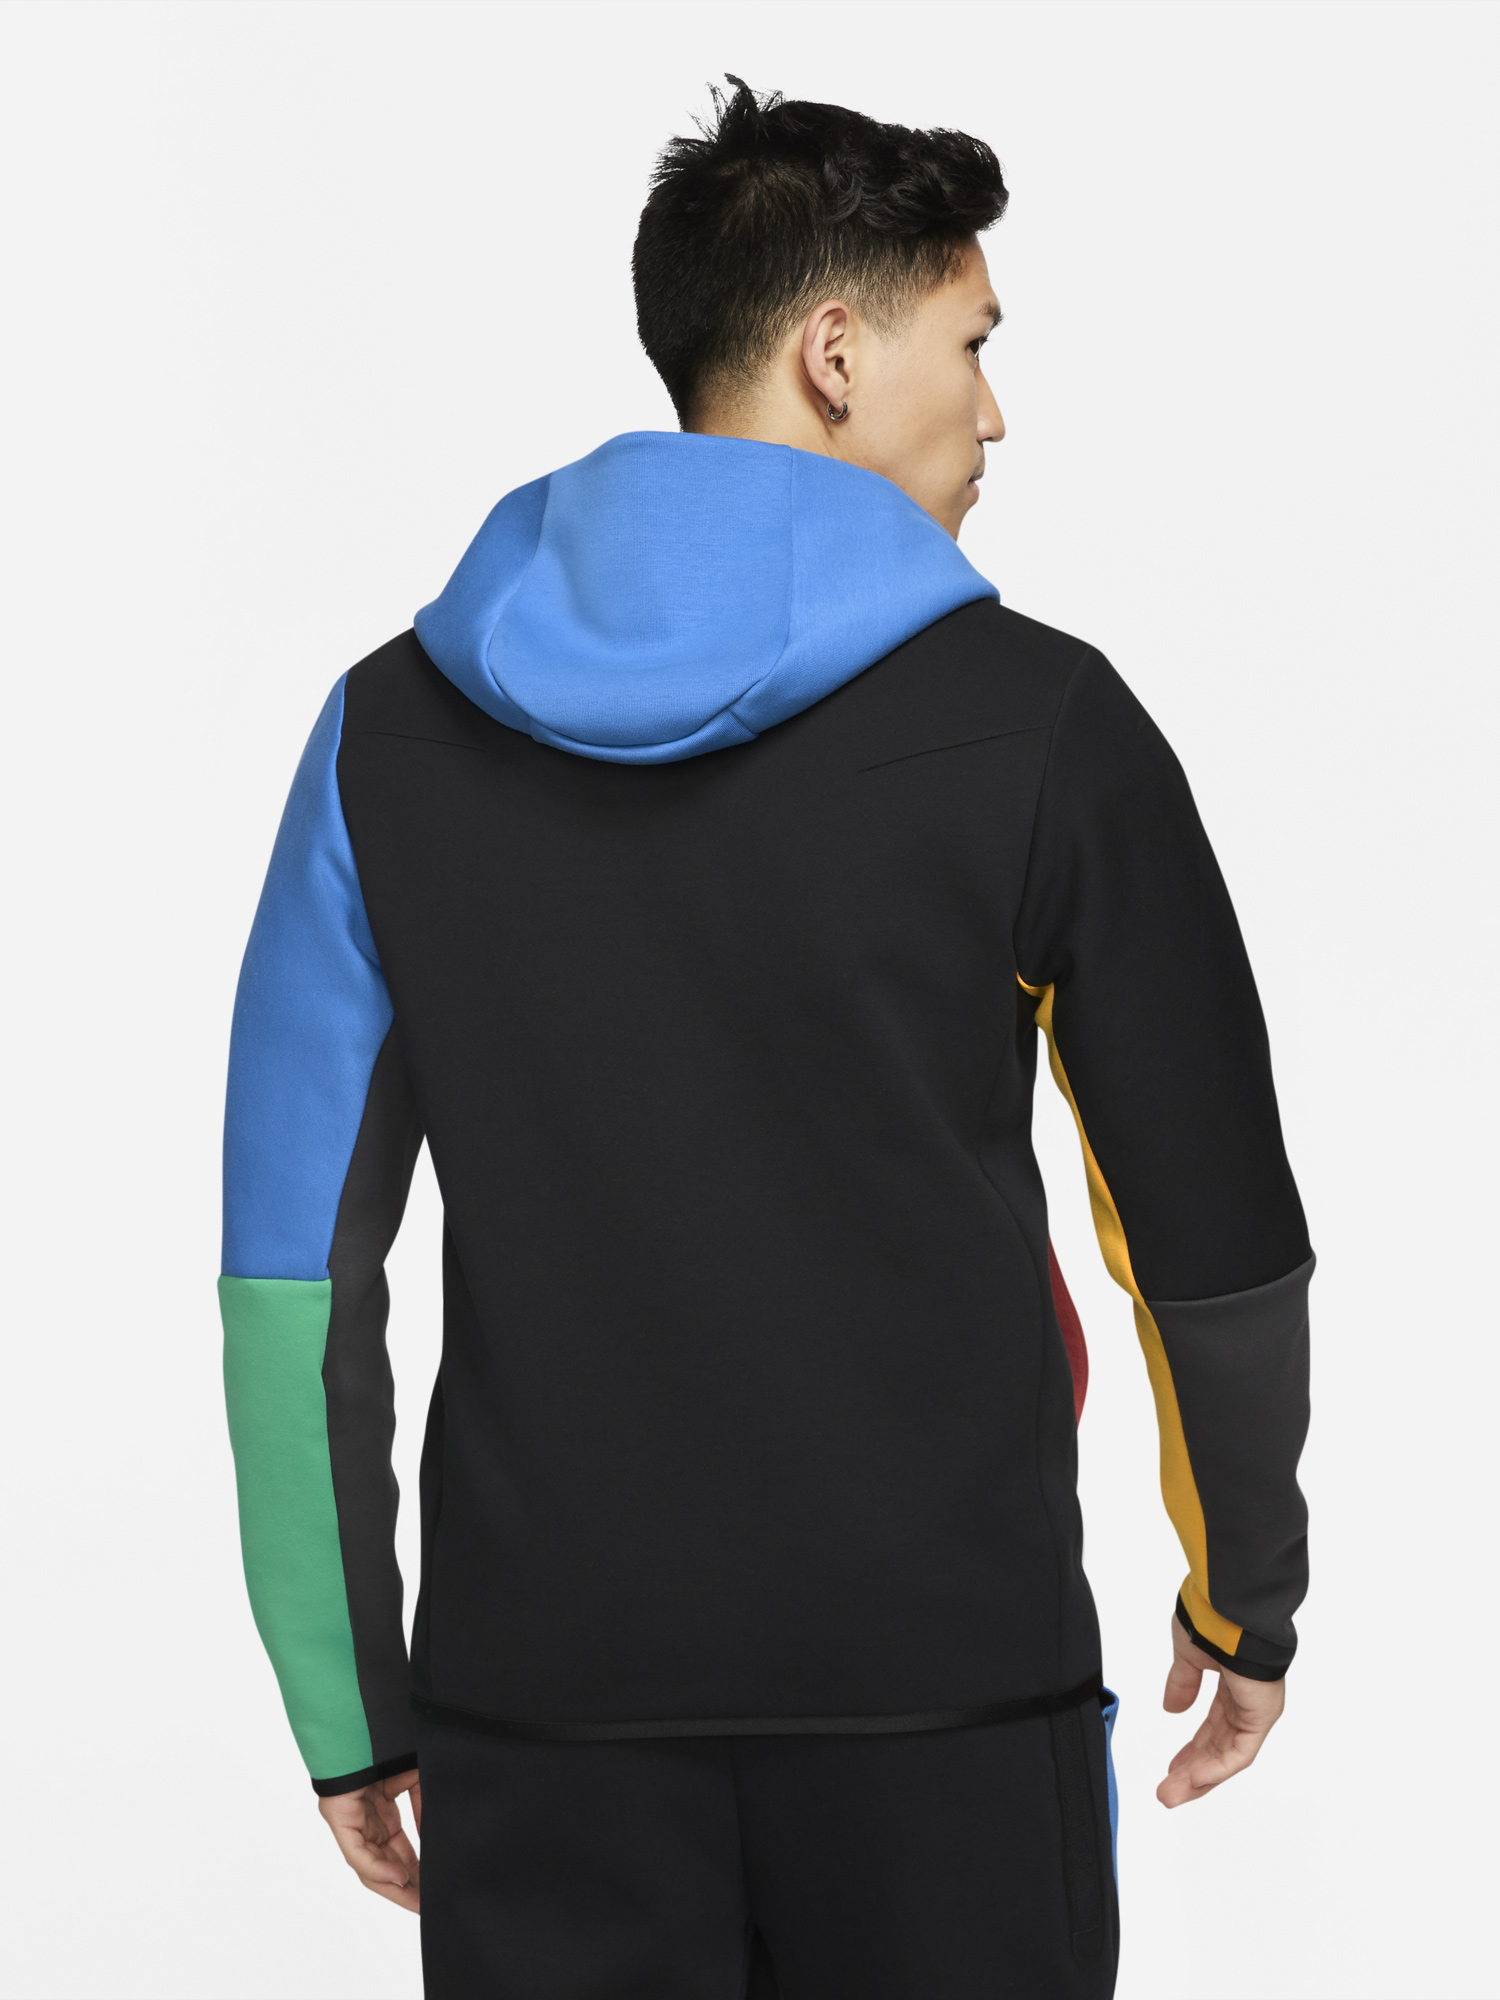 nike-tech-flece-multi-color-hoodie-blue-green-red-2